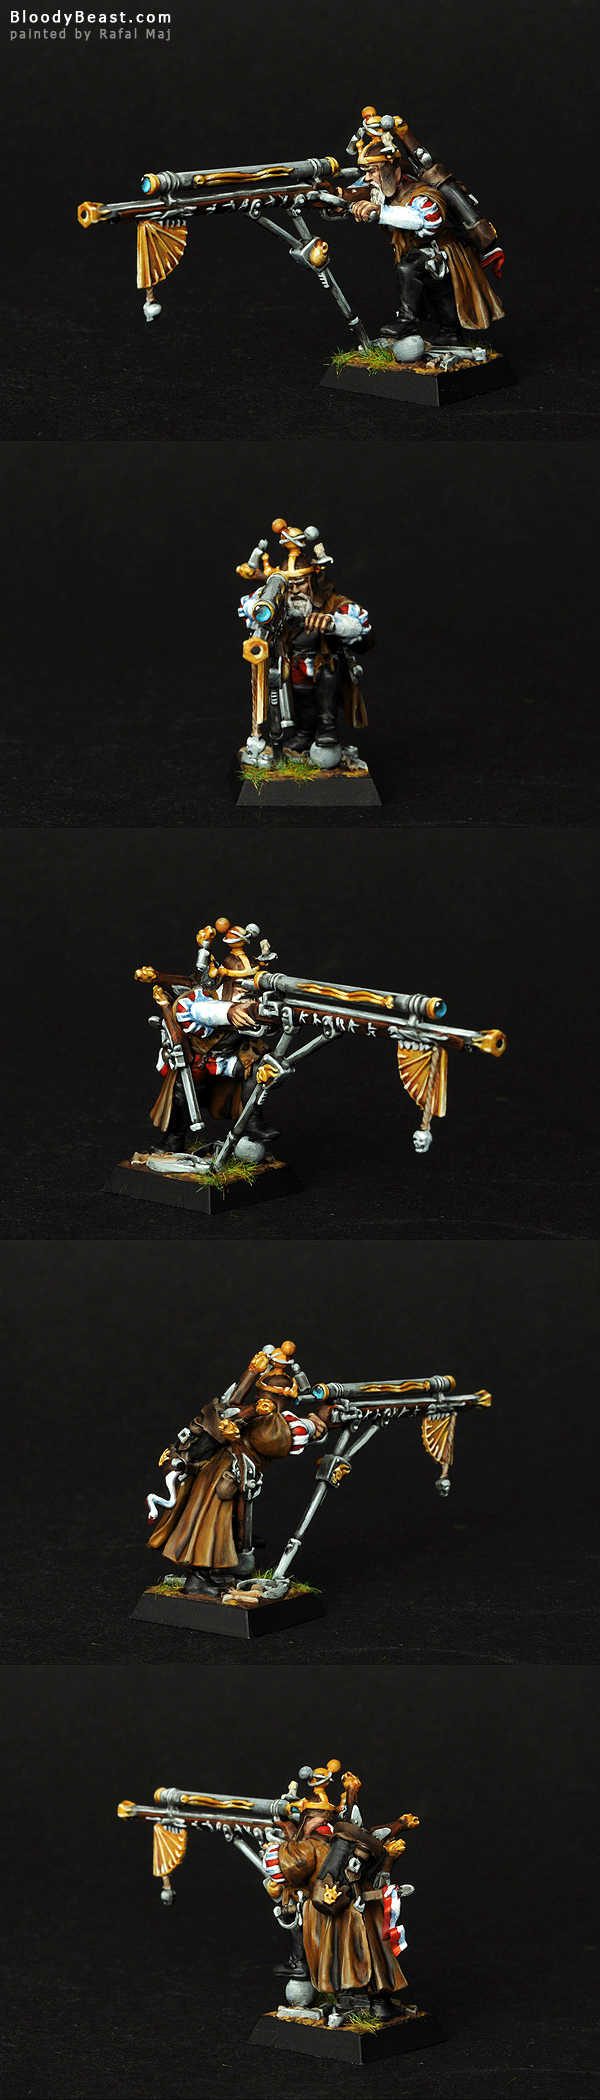 Empire Engineer painted by Rafal Maj (BloodyBeast.com)